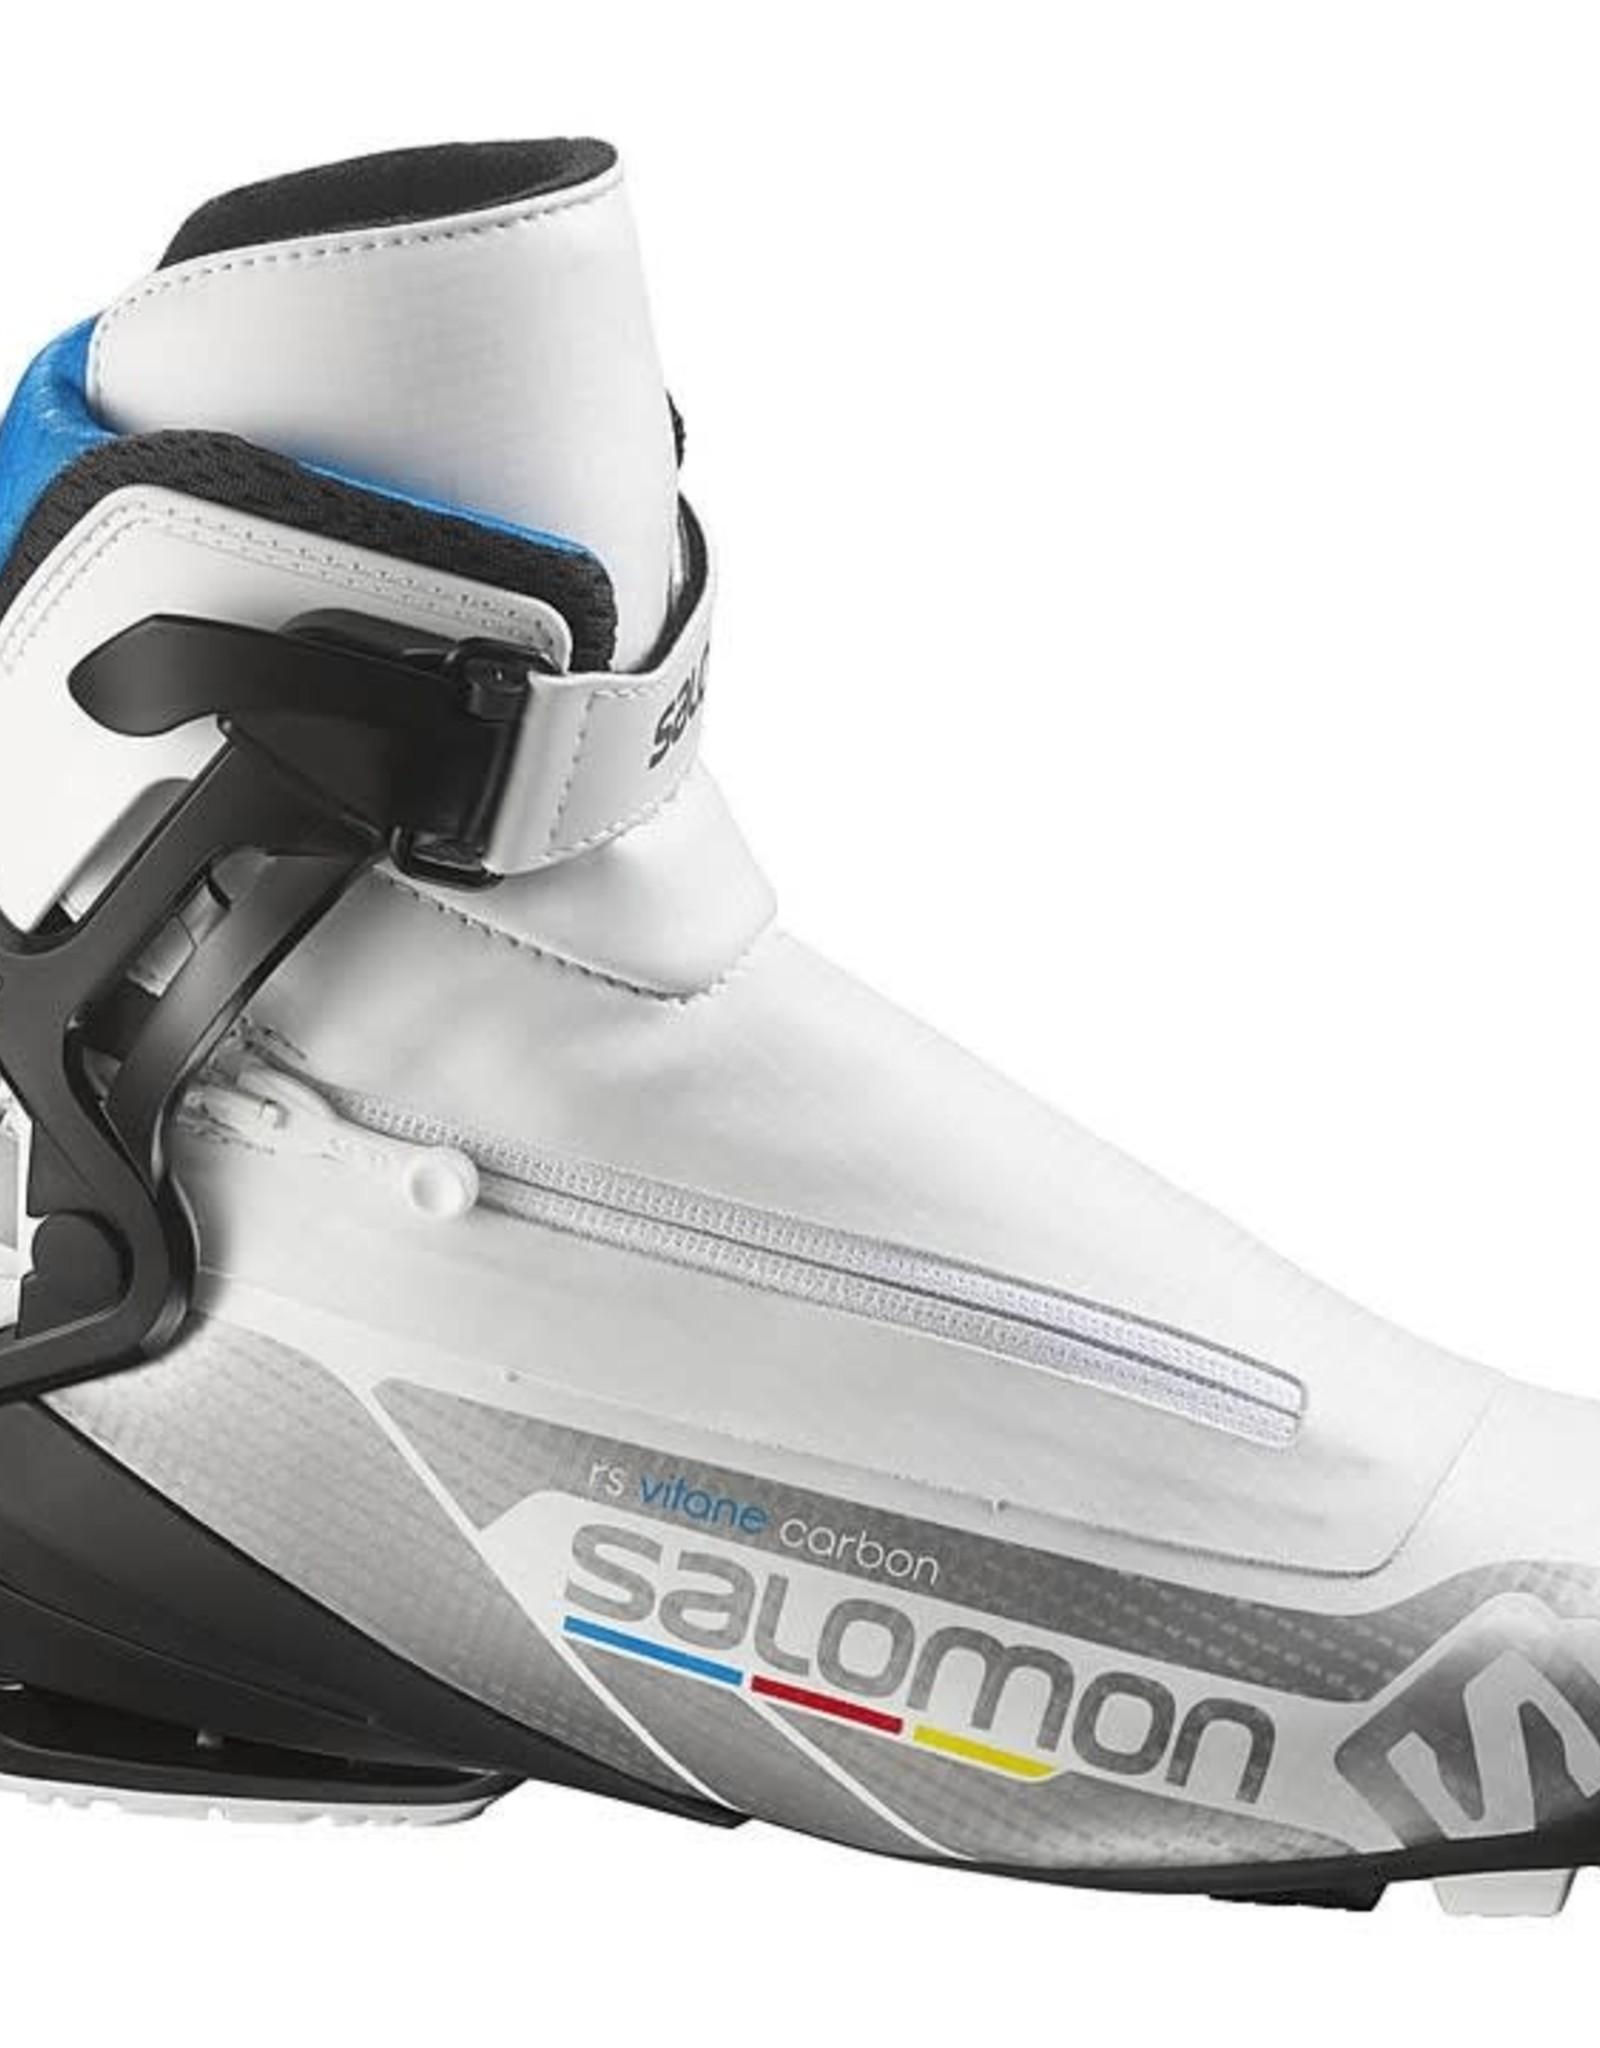 SALOMON SALOMON Race Skate Vitane Carbon PILOT